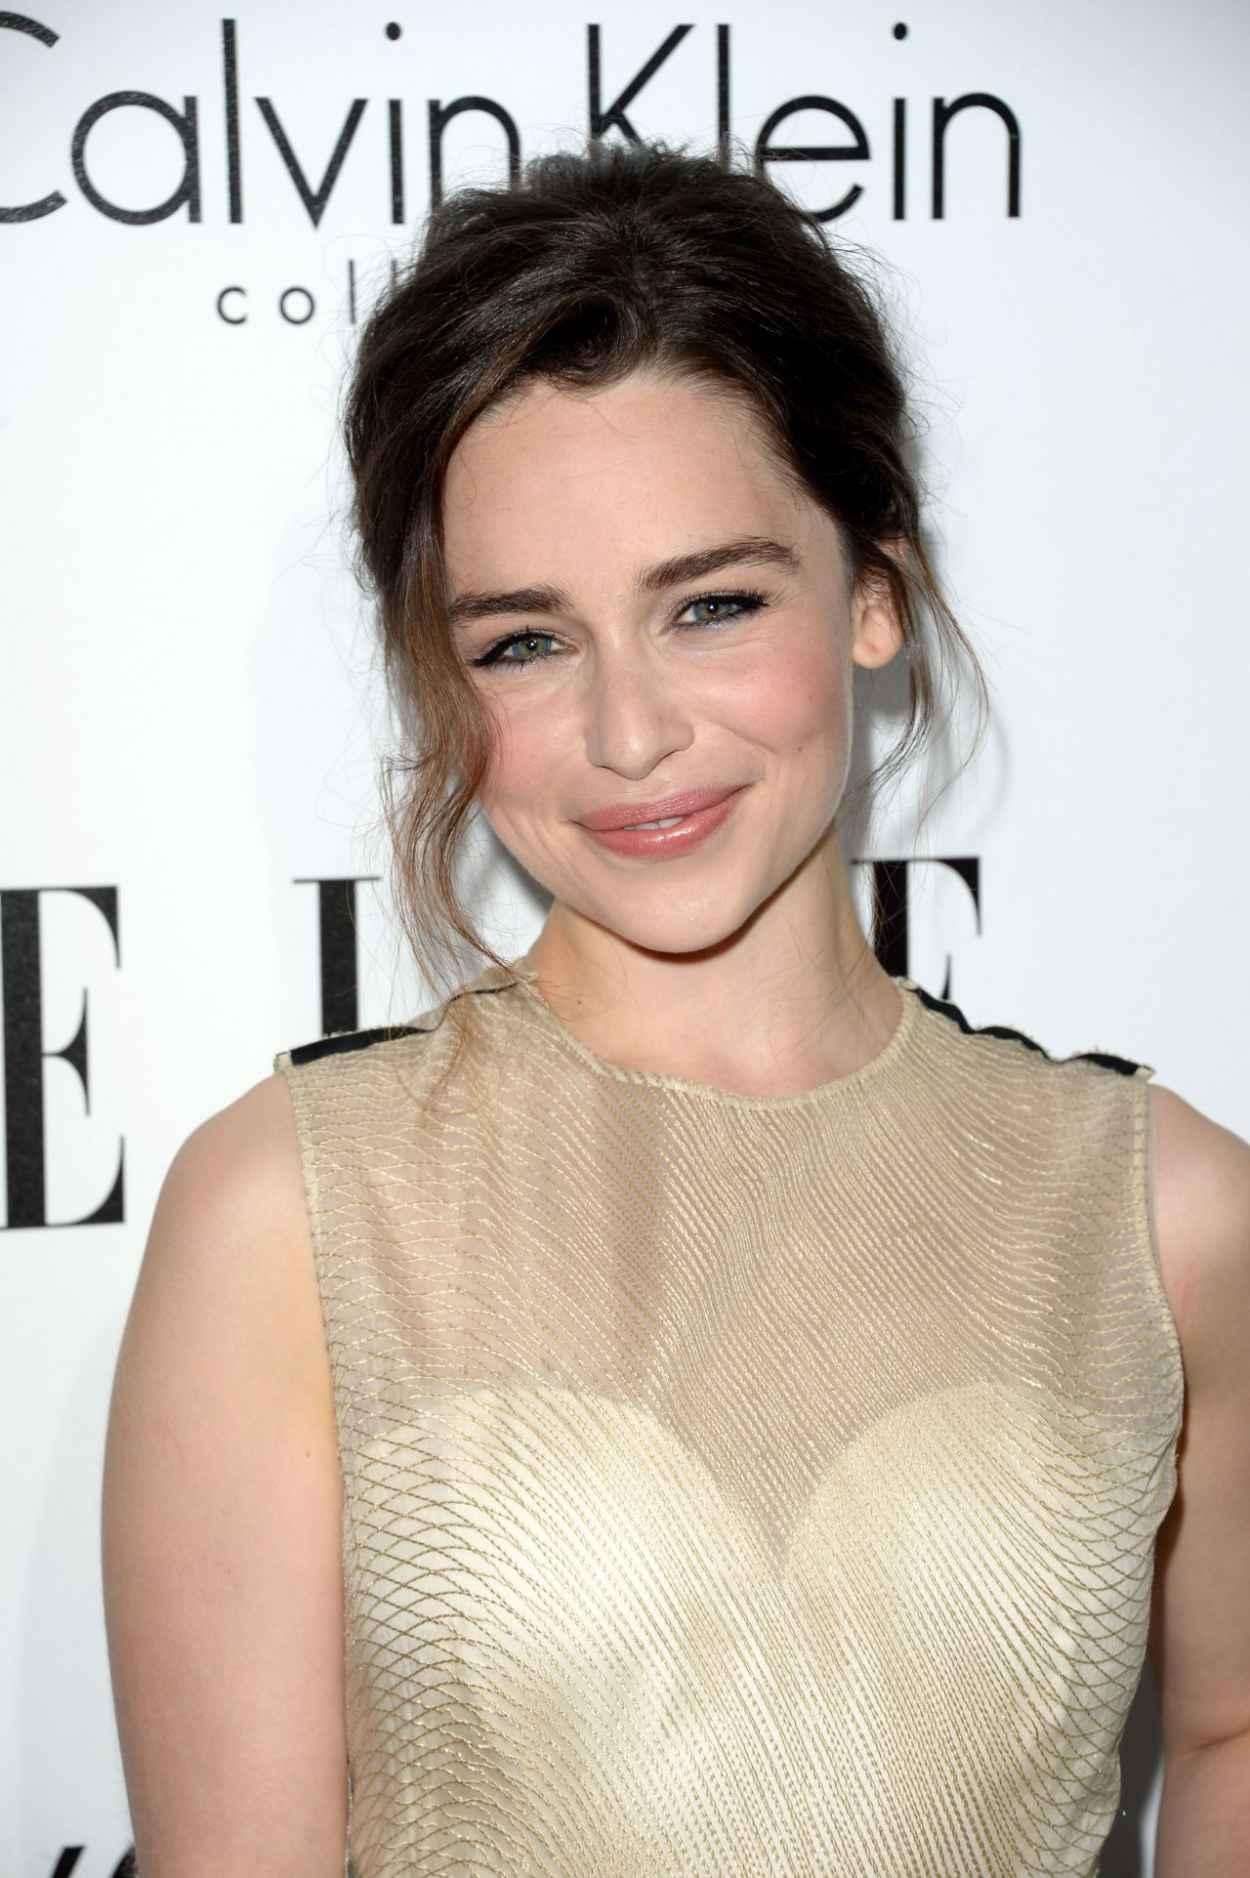 Emilia Clarke - ELLEs 20th Annual Women In Hollywood Celebration-1